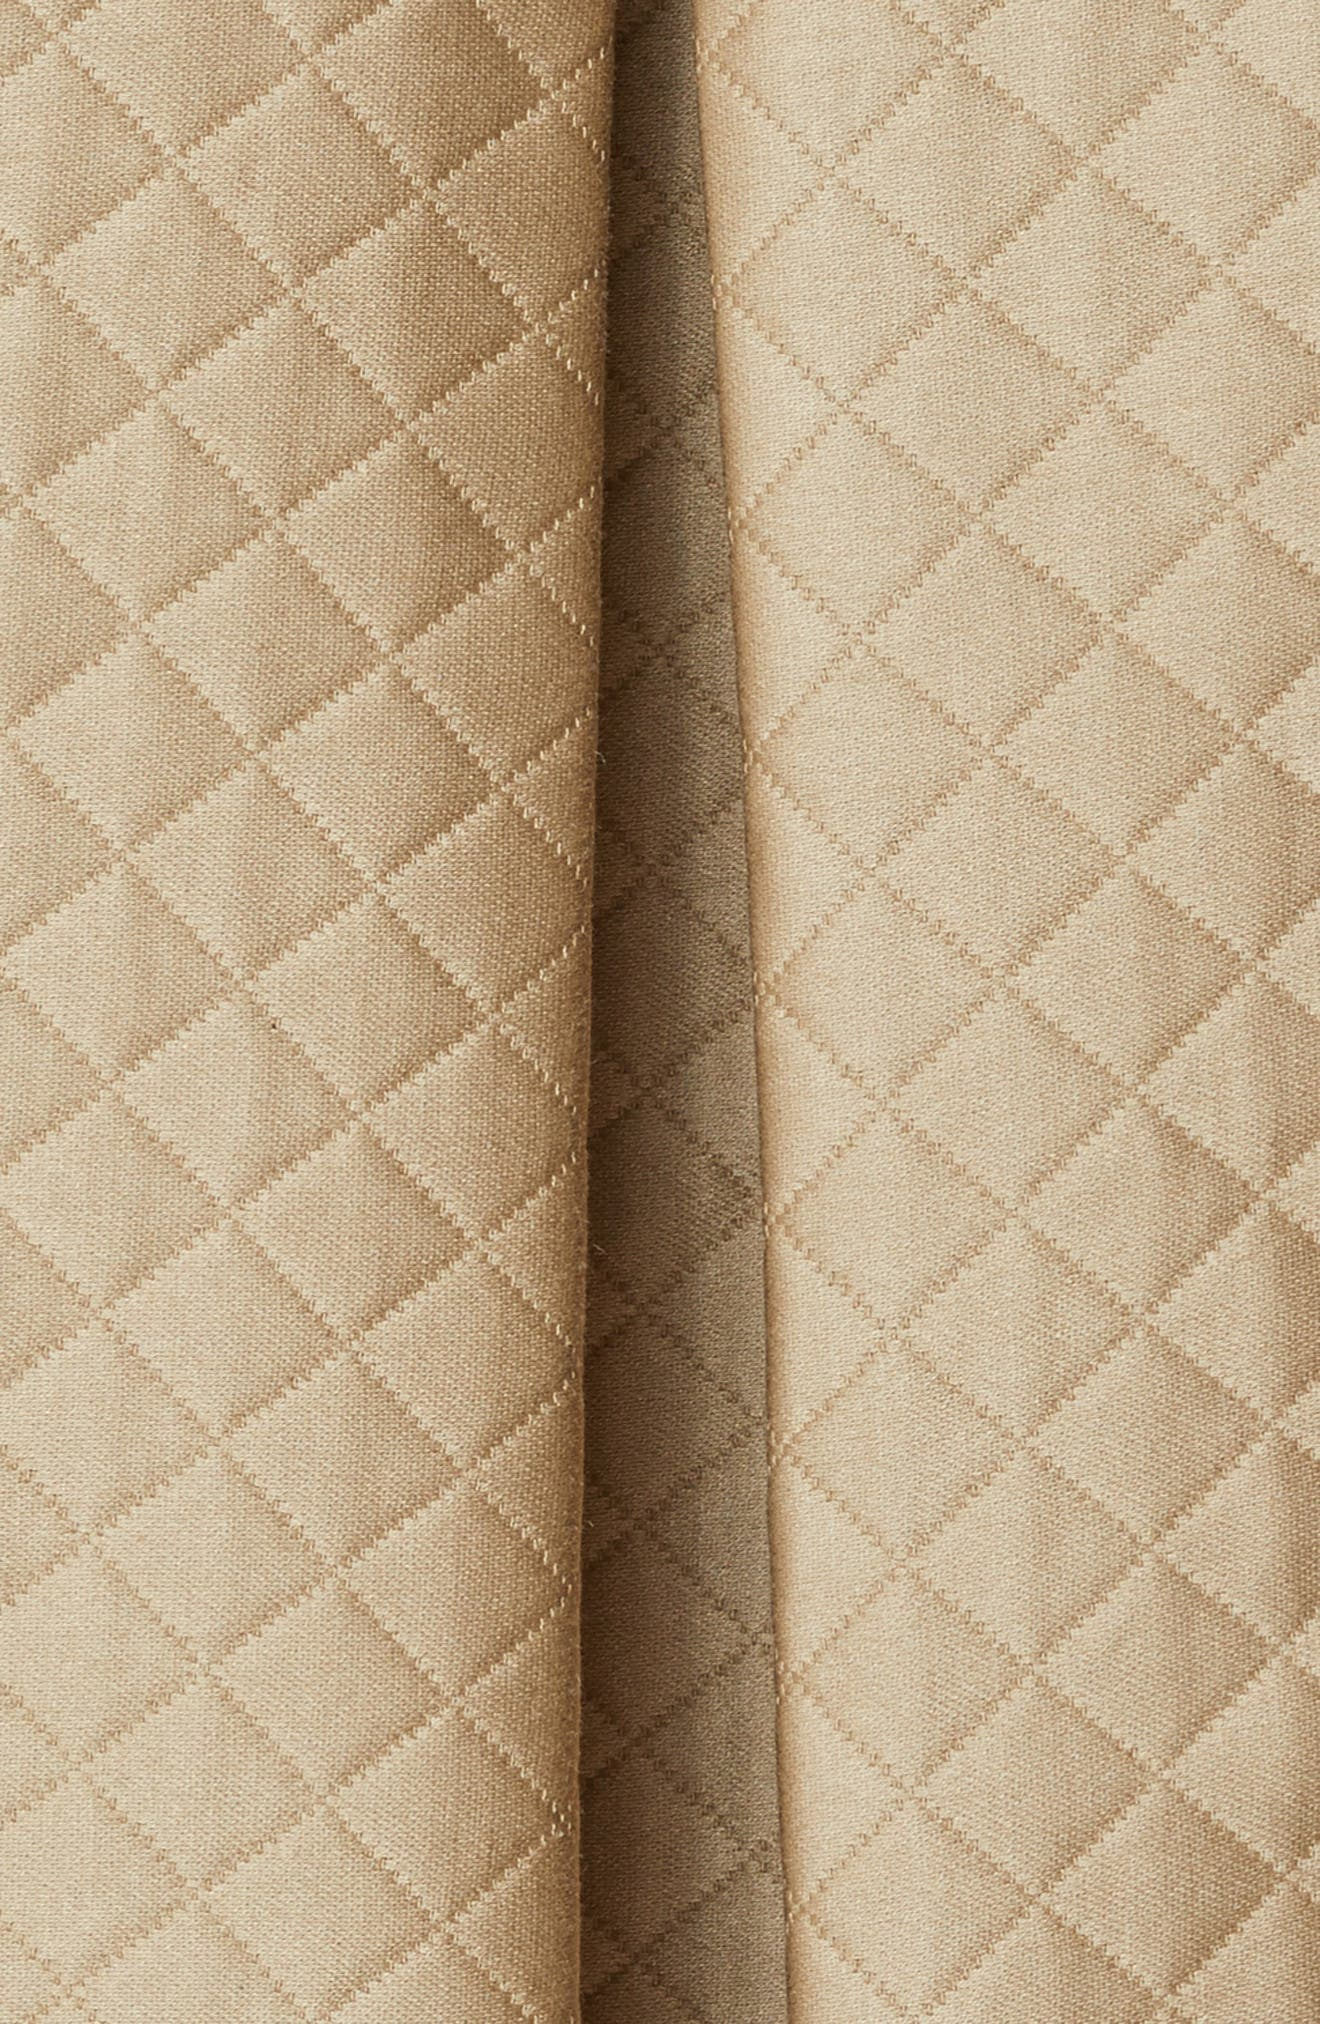 Bari Dust Ruffle,                             Alternate thumbnail 2, color,                             TAUPE